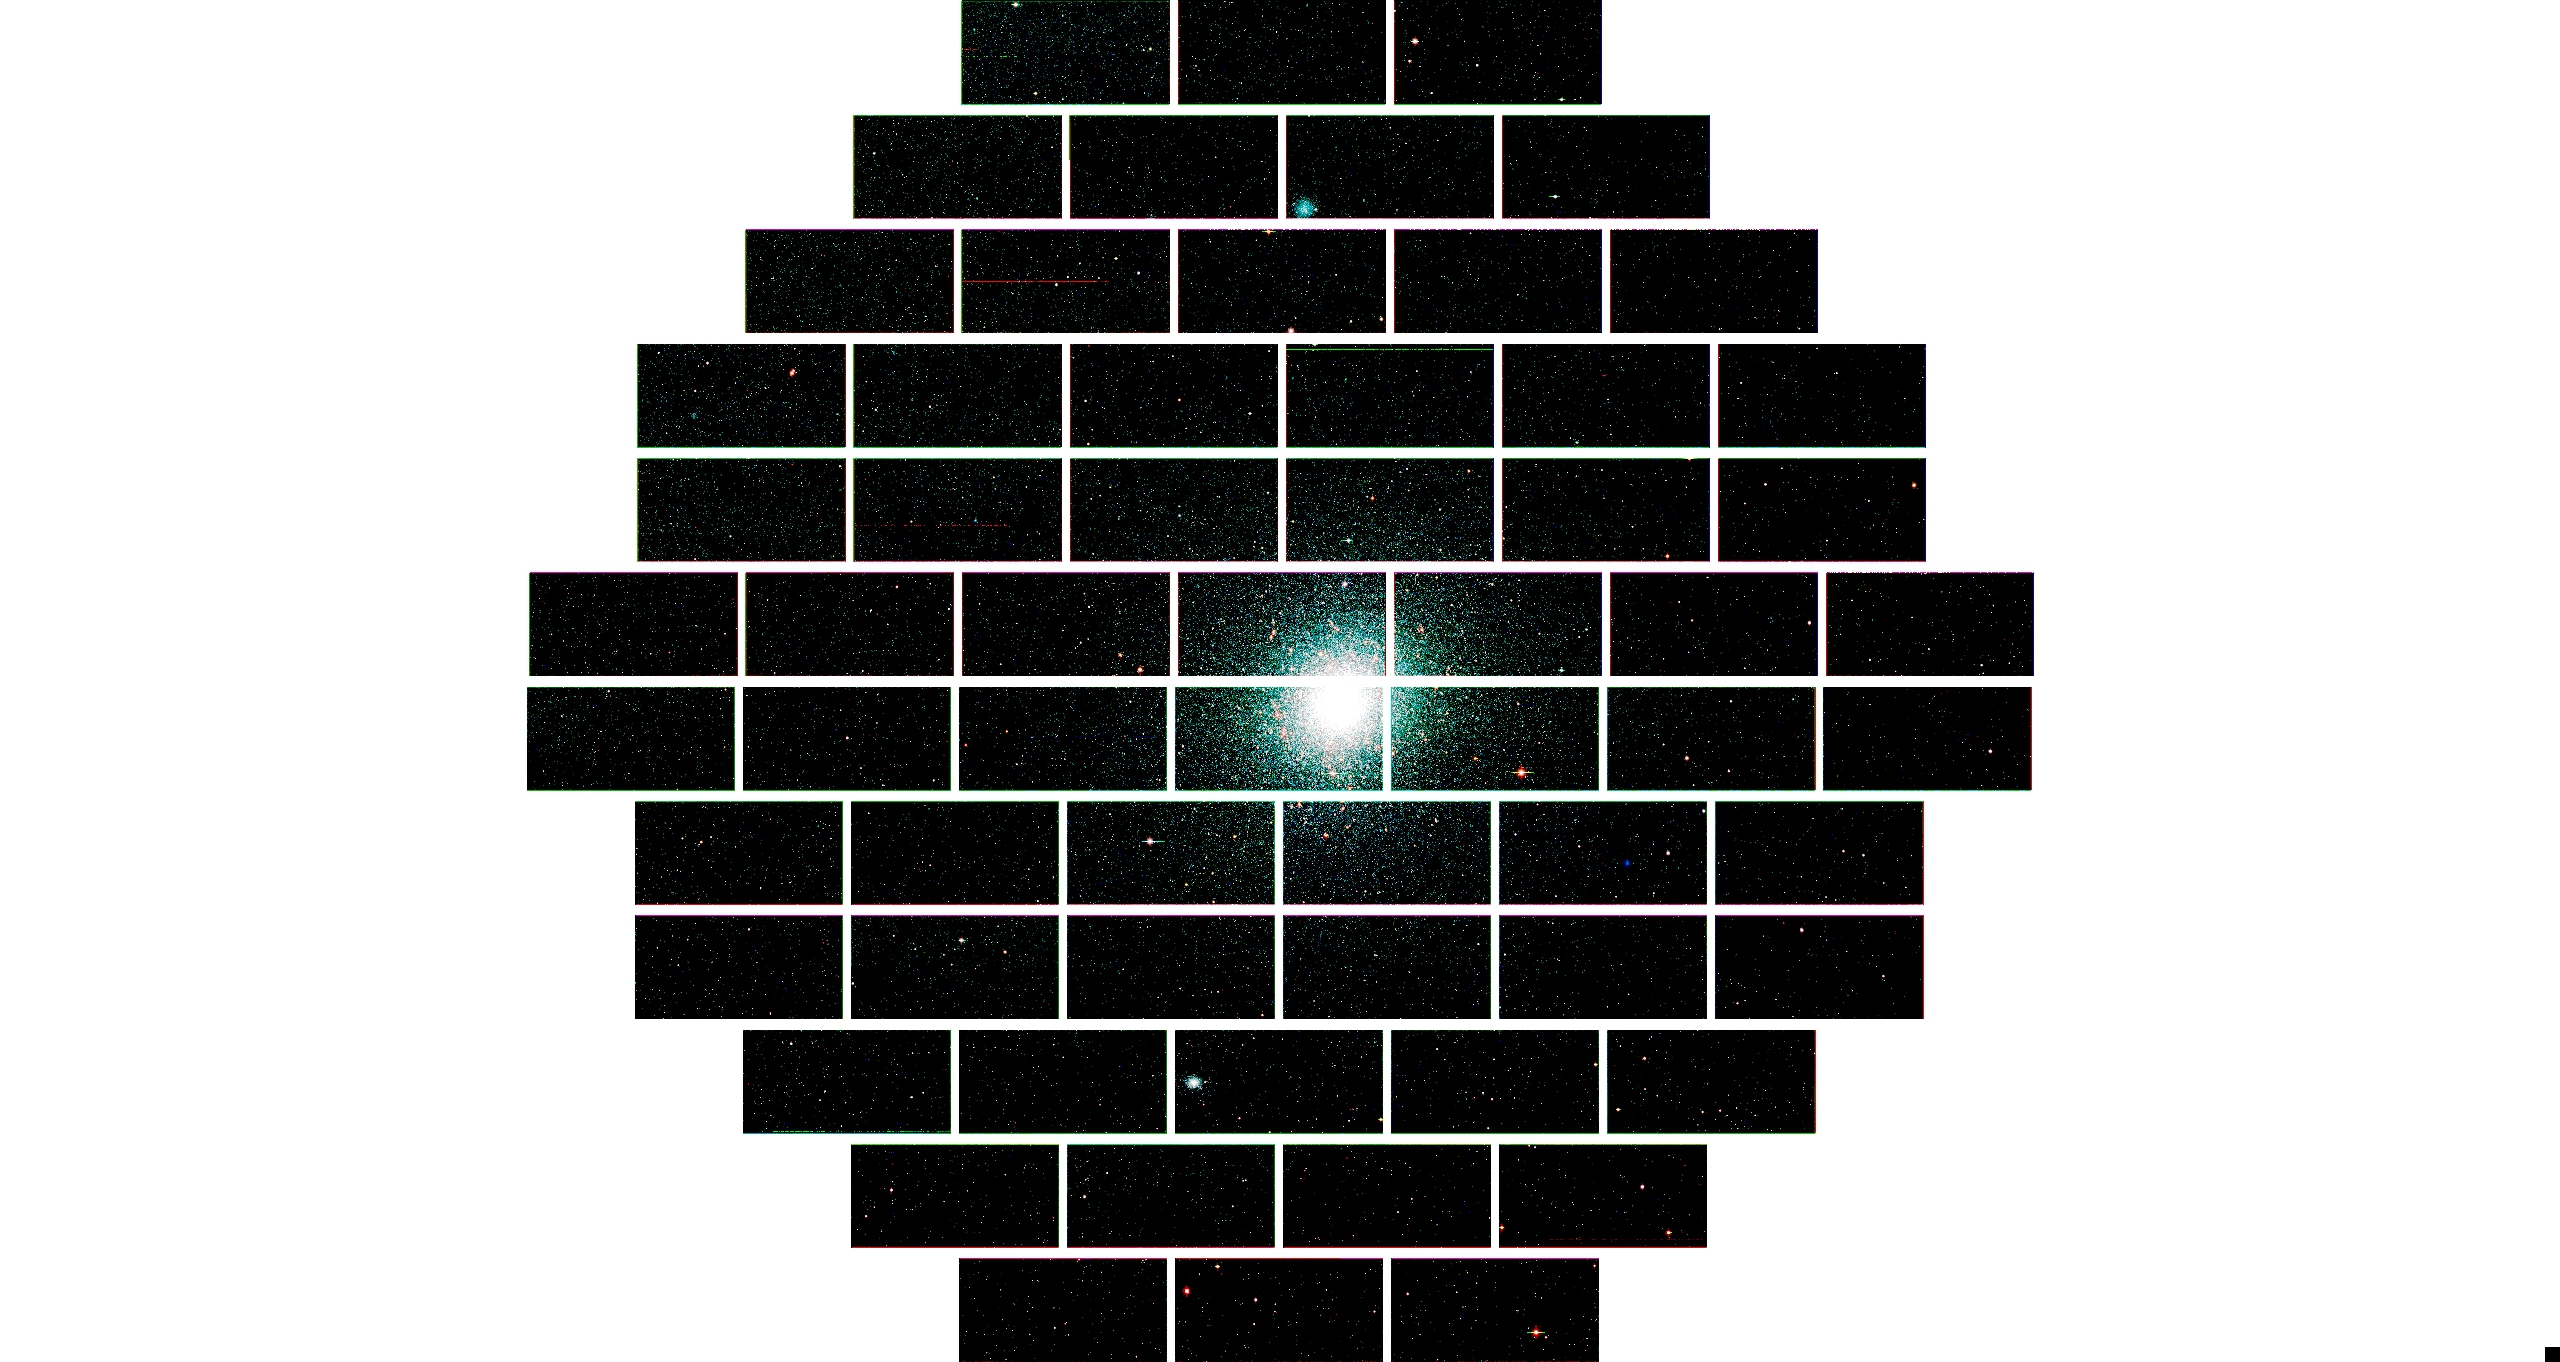 Globular Star Cluster 47 Tucanae